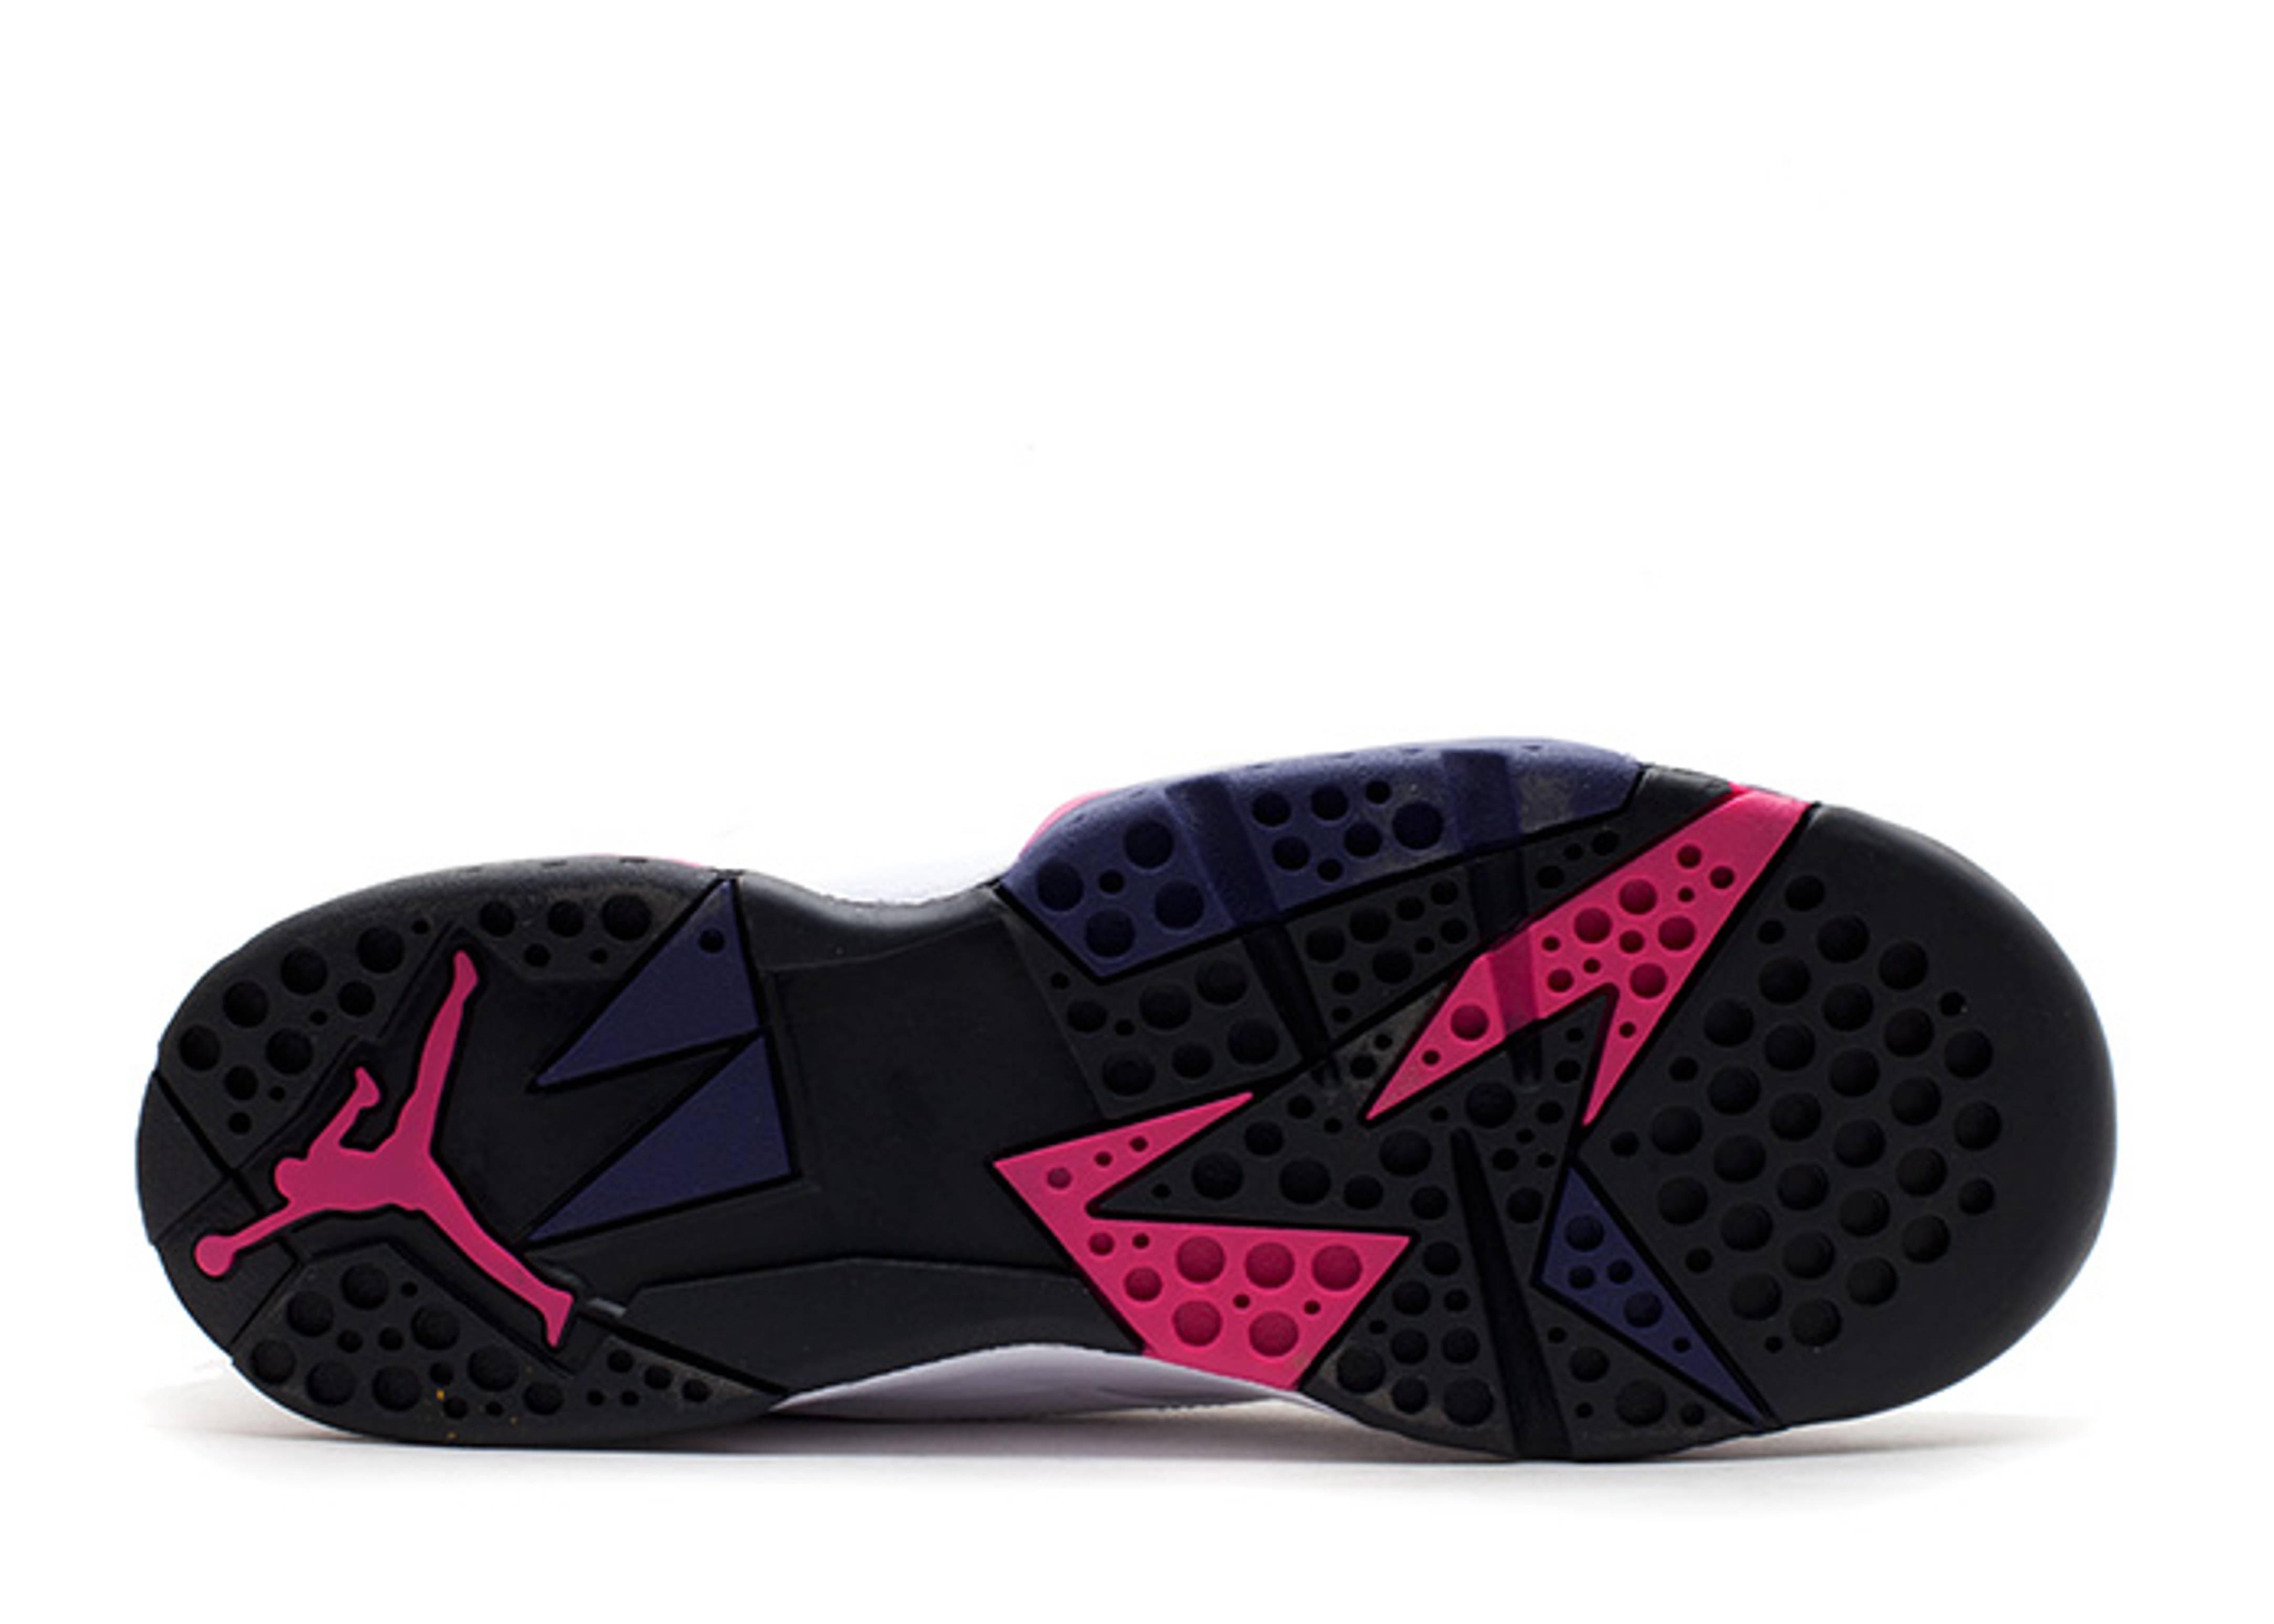 be8a03bf31be Girls Air Jordan 7 Retro (gs) - Air Jordan - 442960 117 - white fireberry-black-night  bl